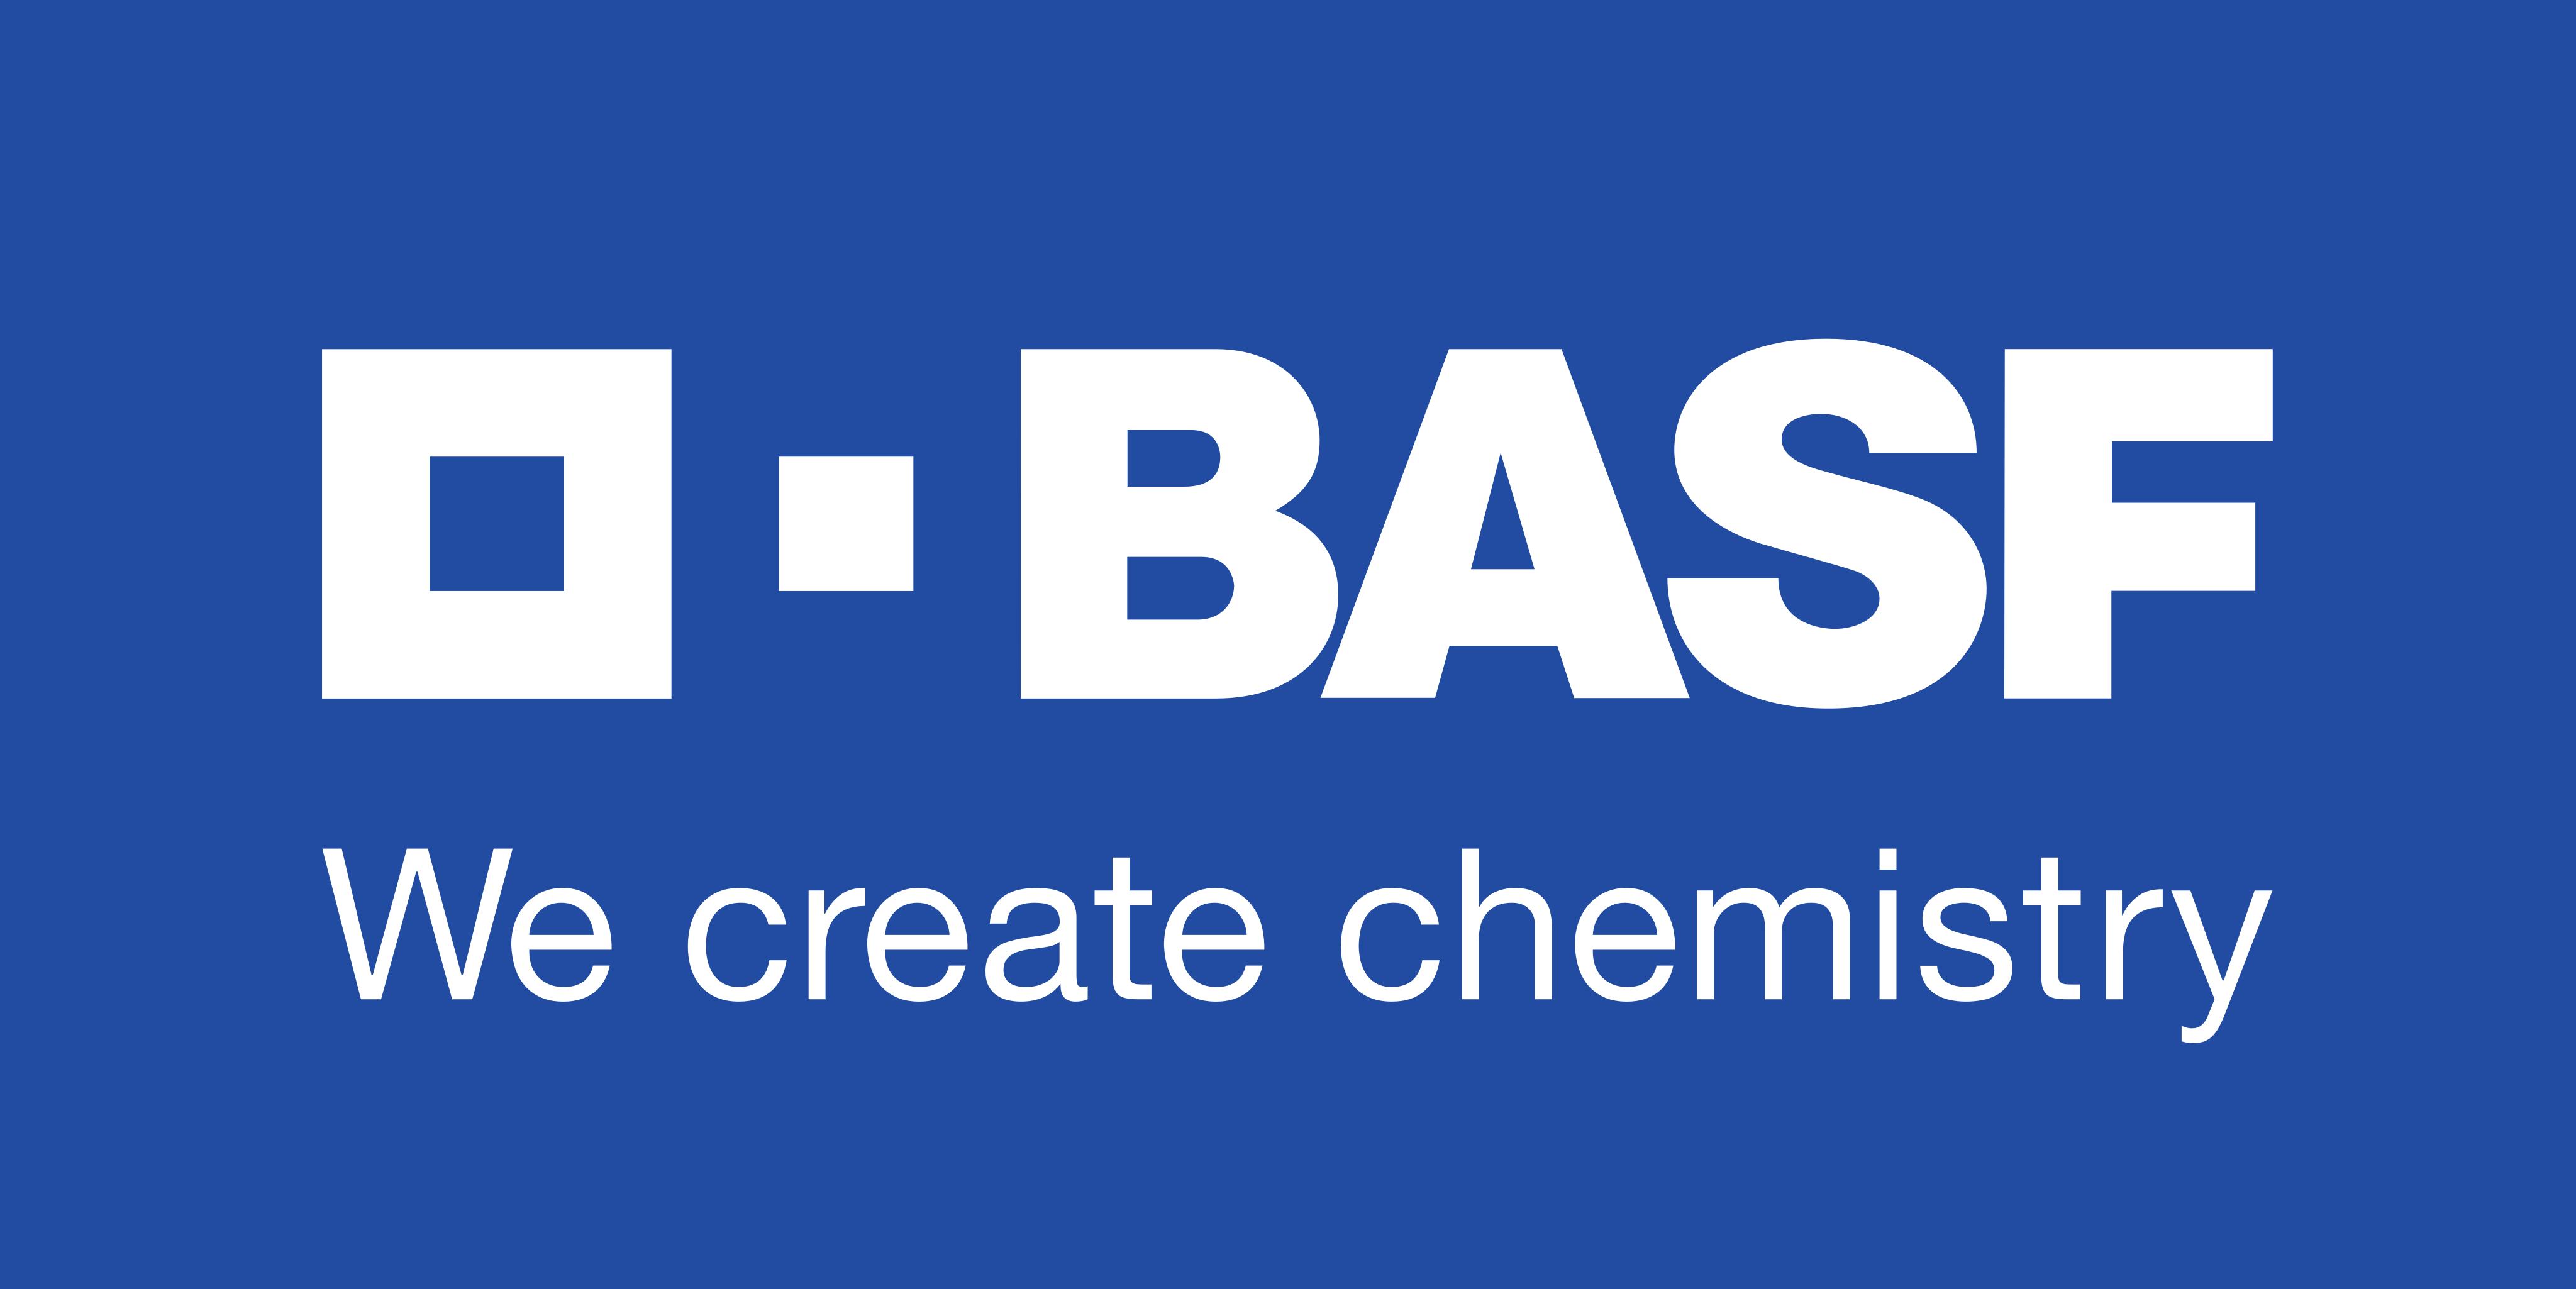 basf logo - BASF Logo